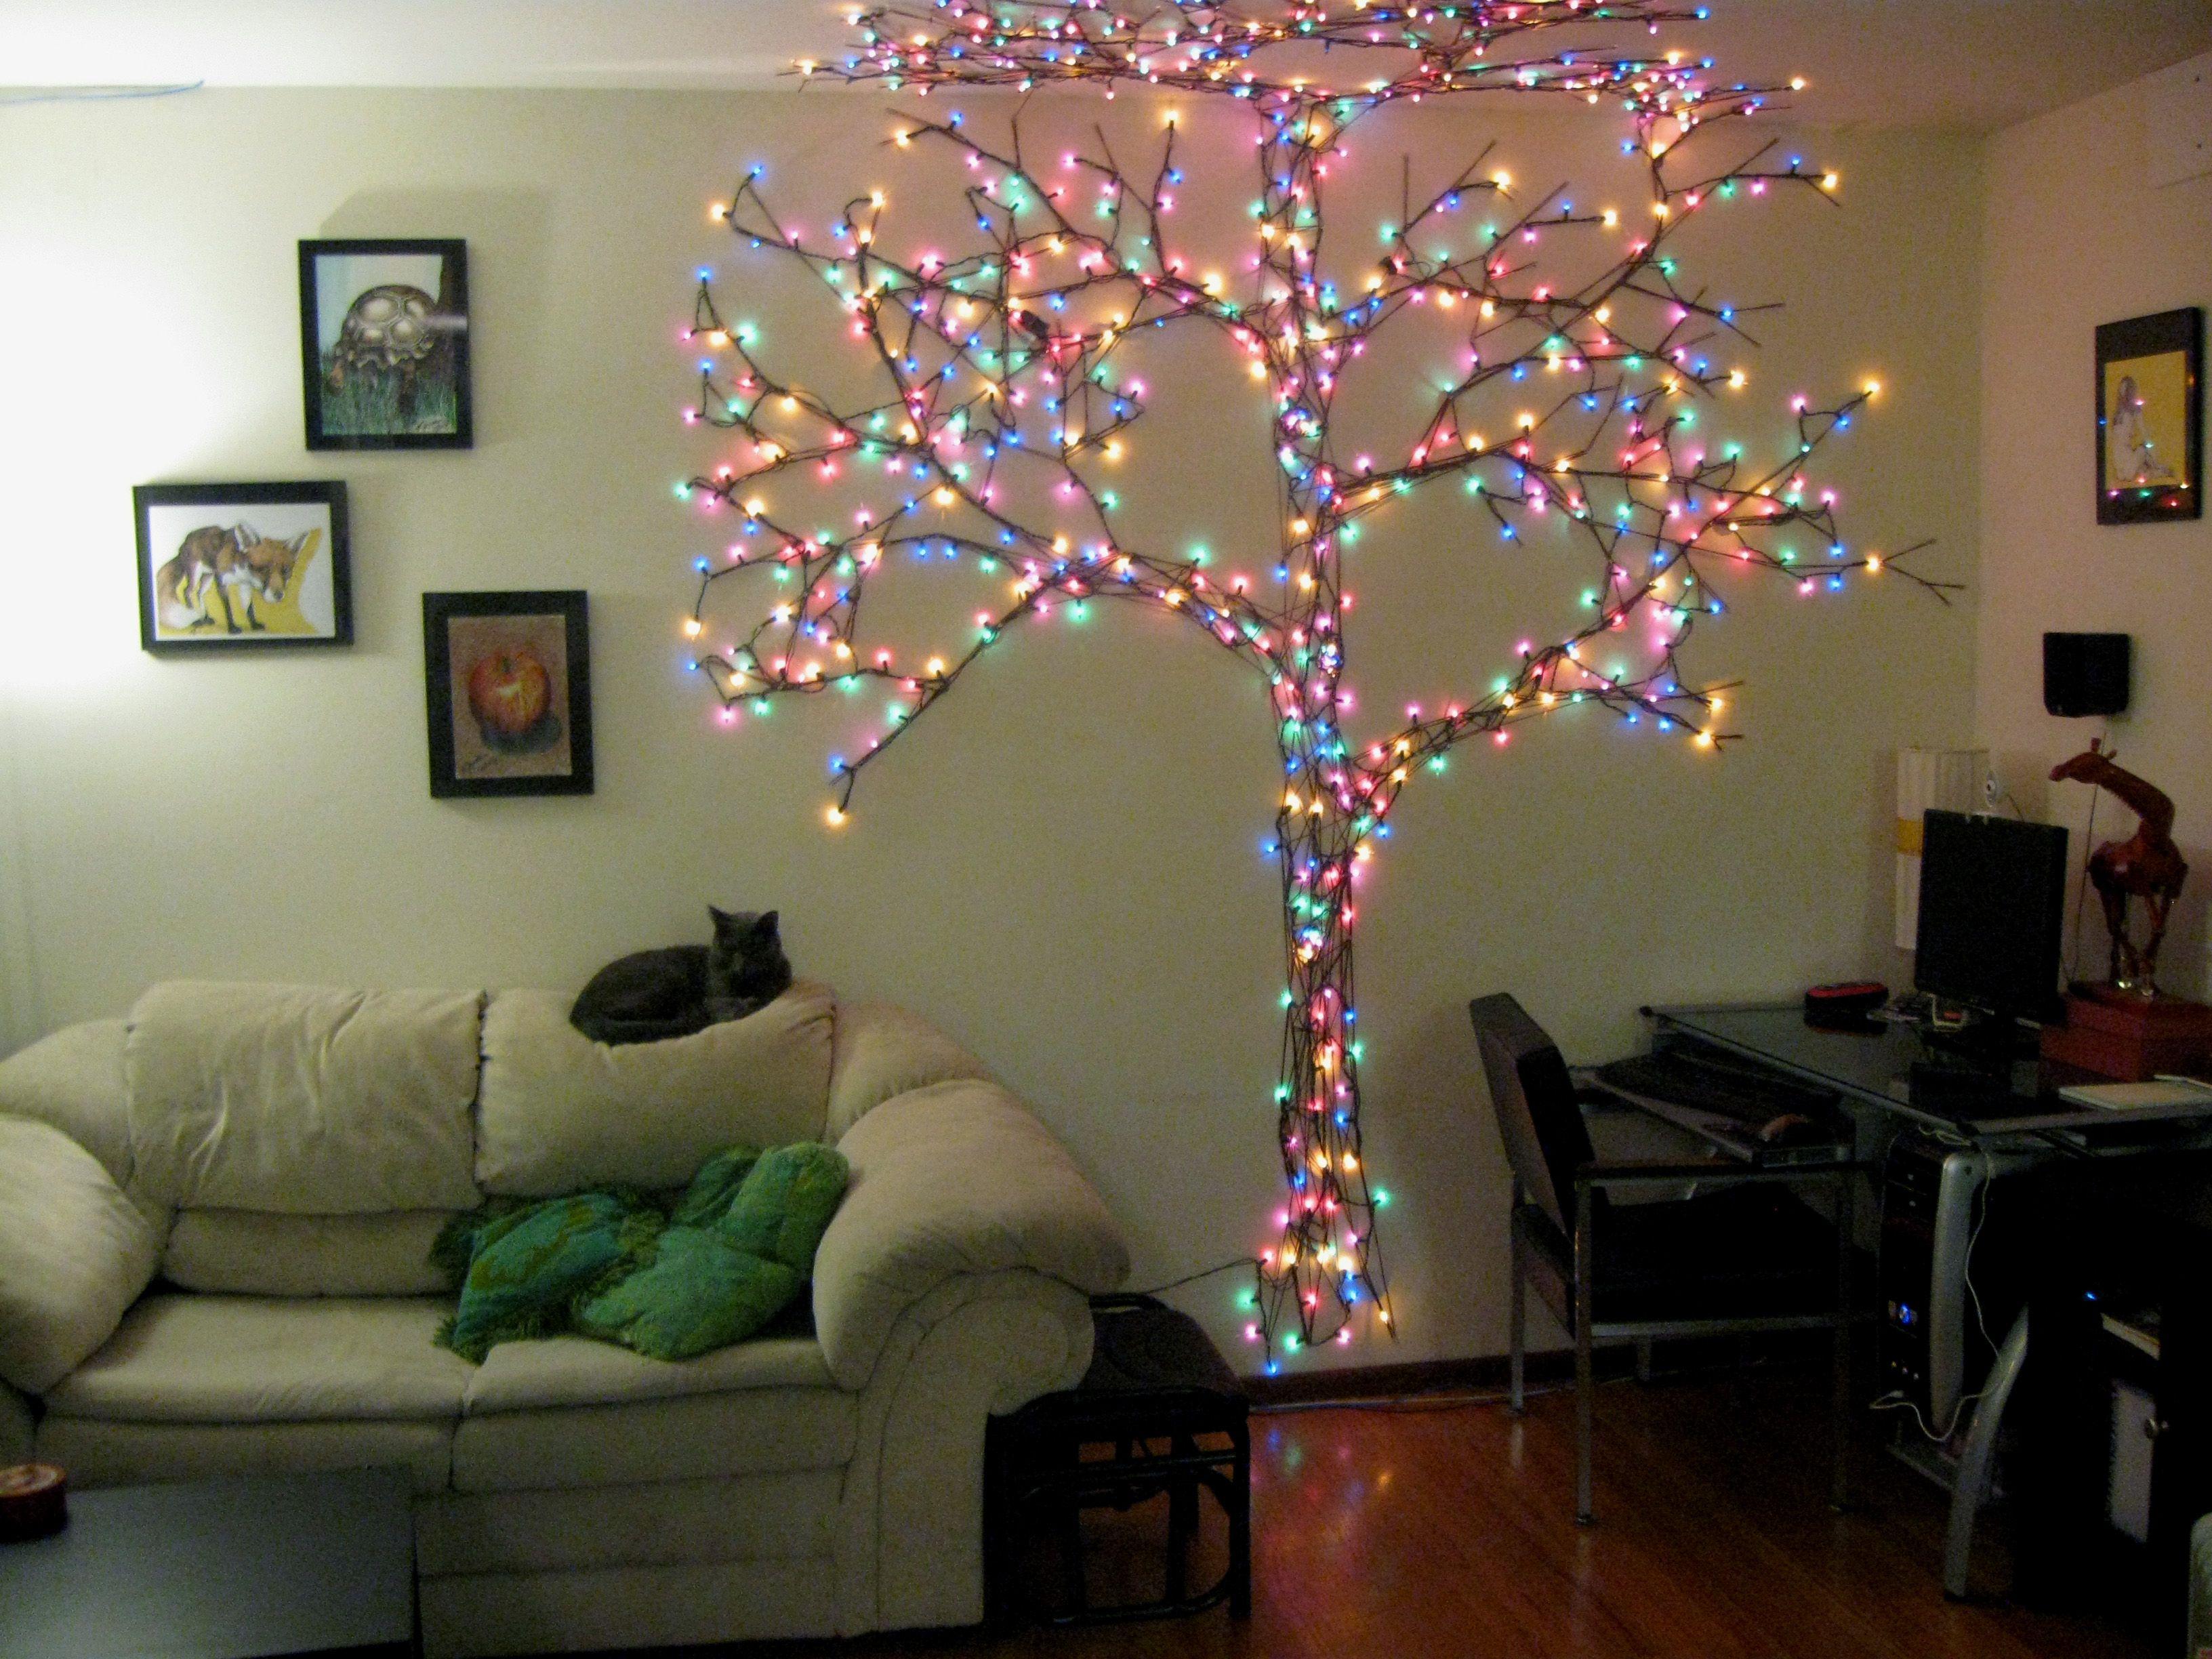 Adhesive Clips For Christmas Lights